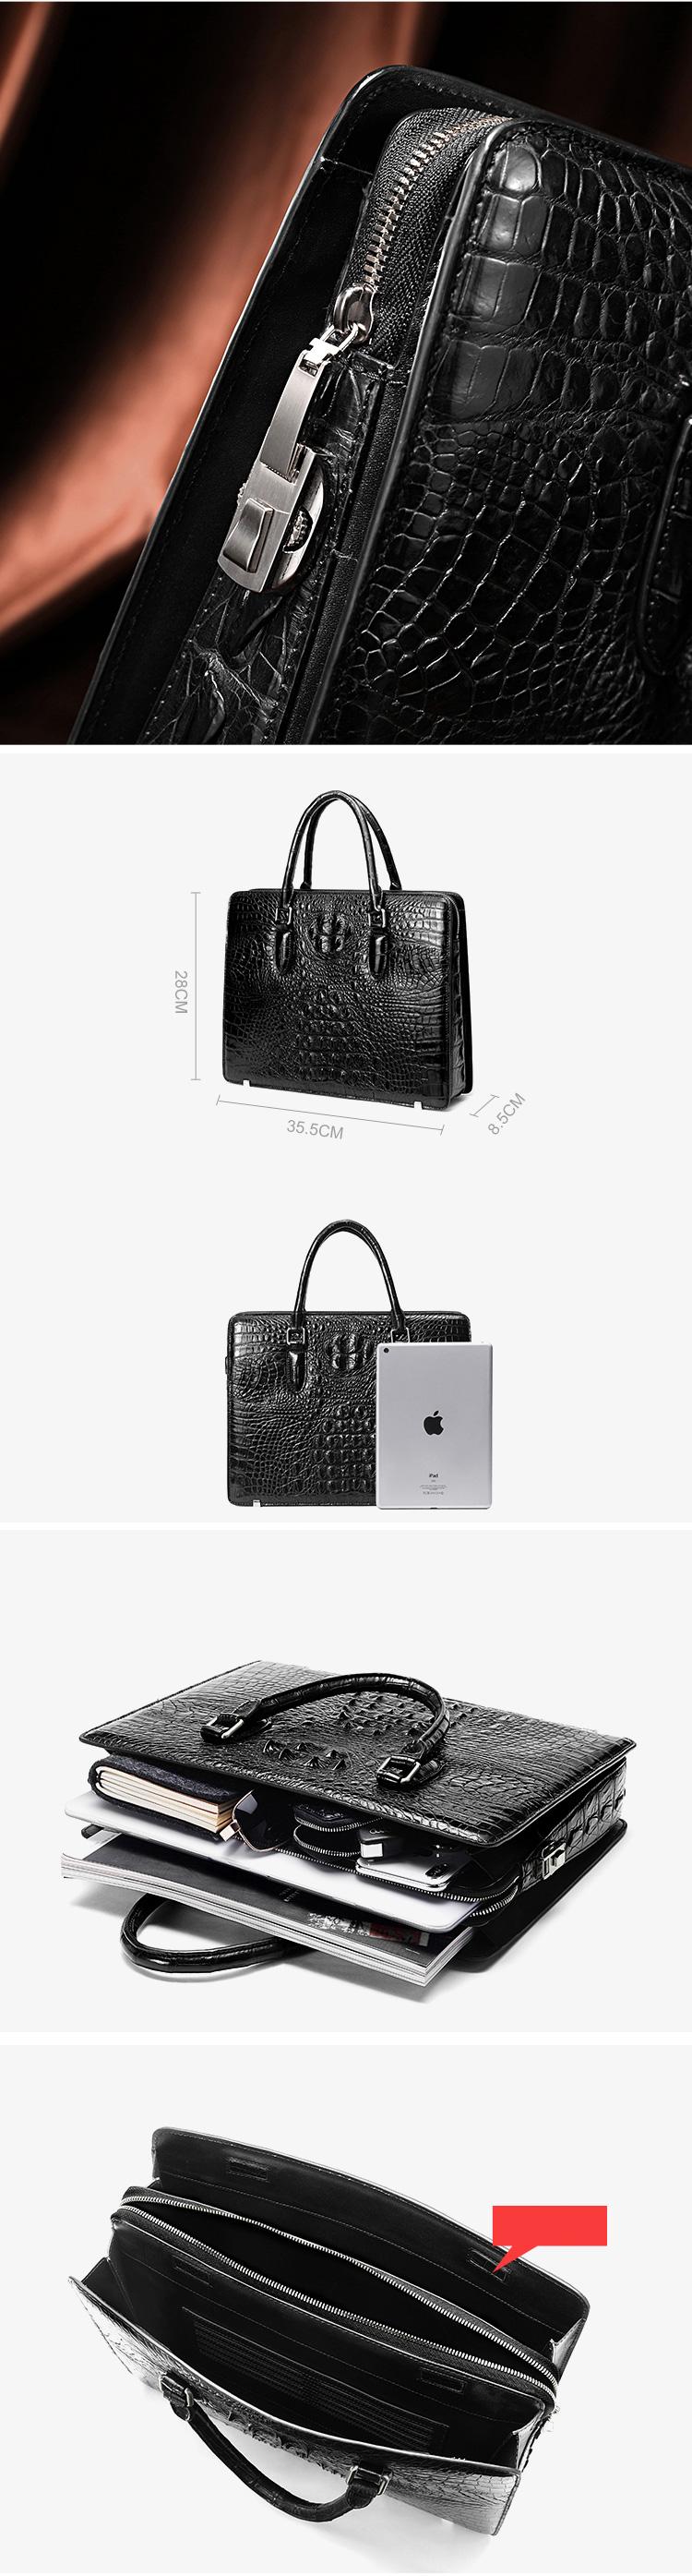 crocodile briefcase (4).jpg